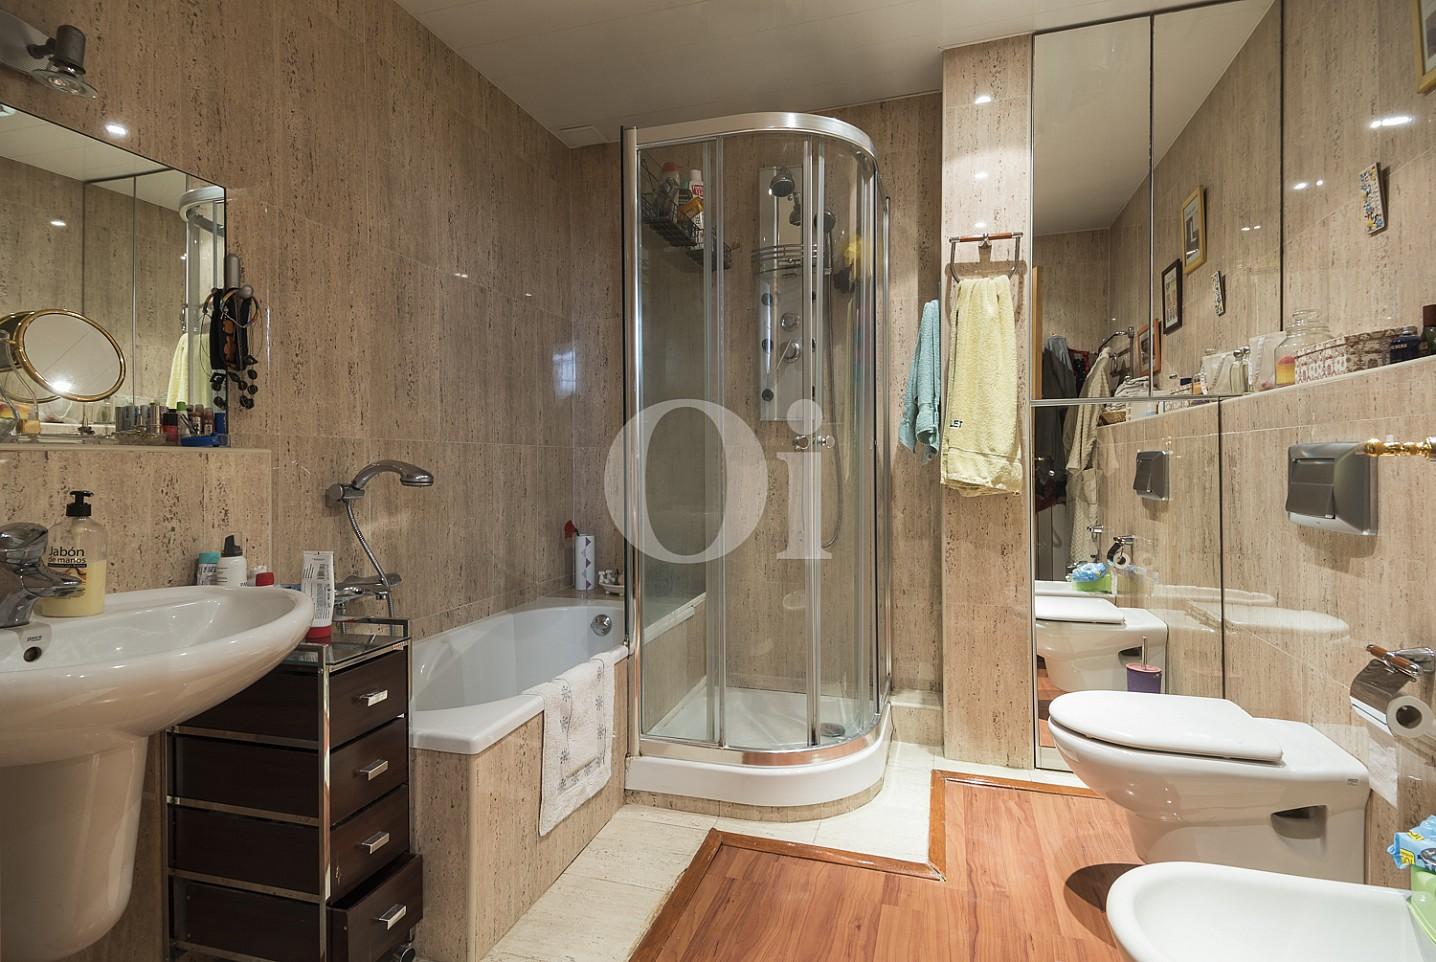 Baño completo con plato de ducha